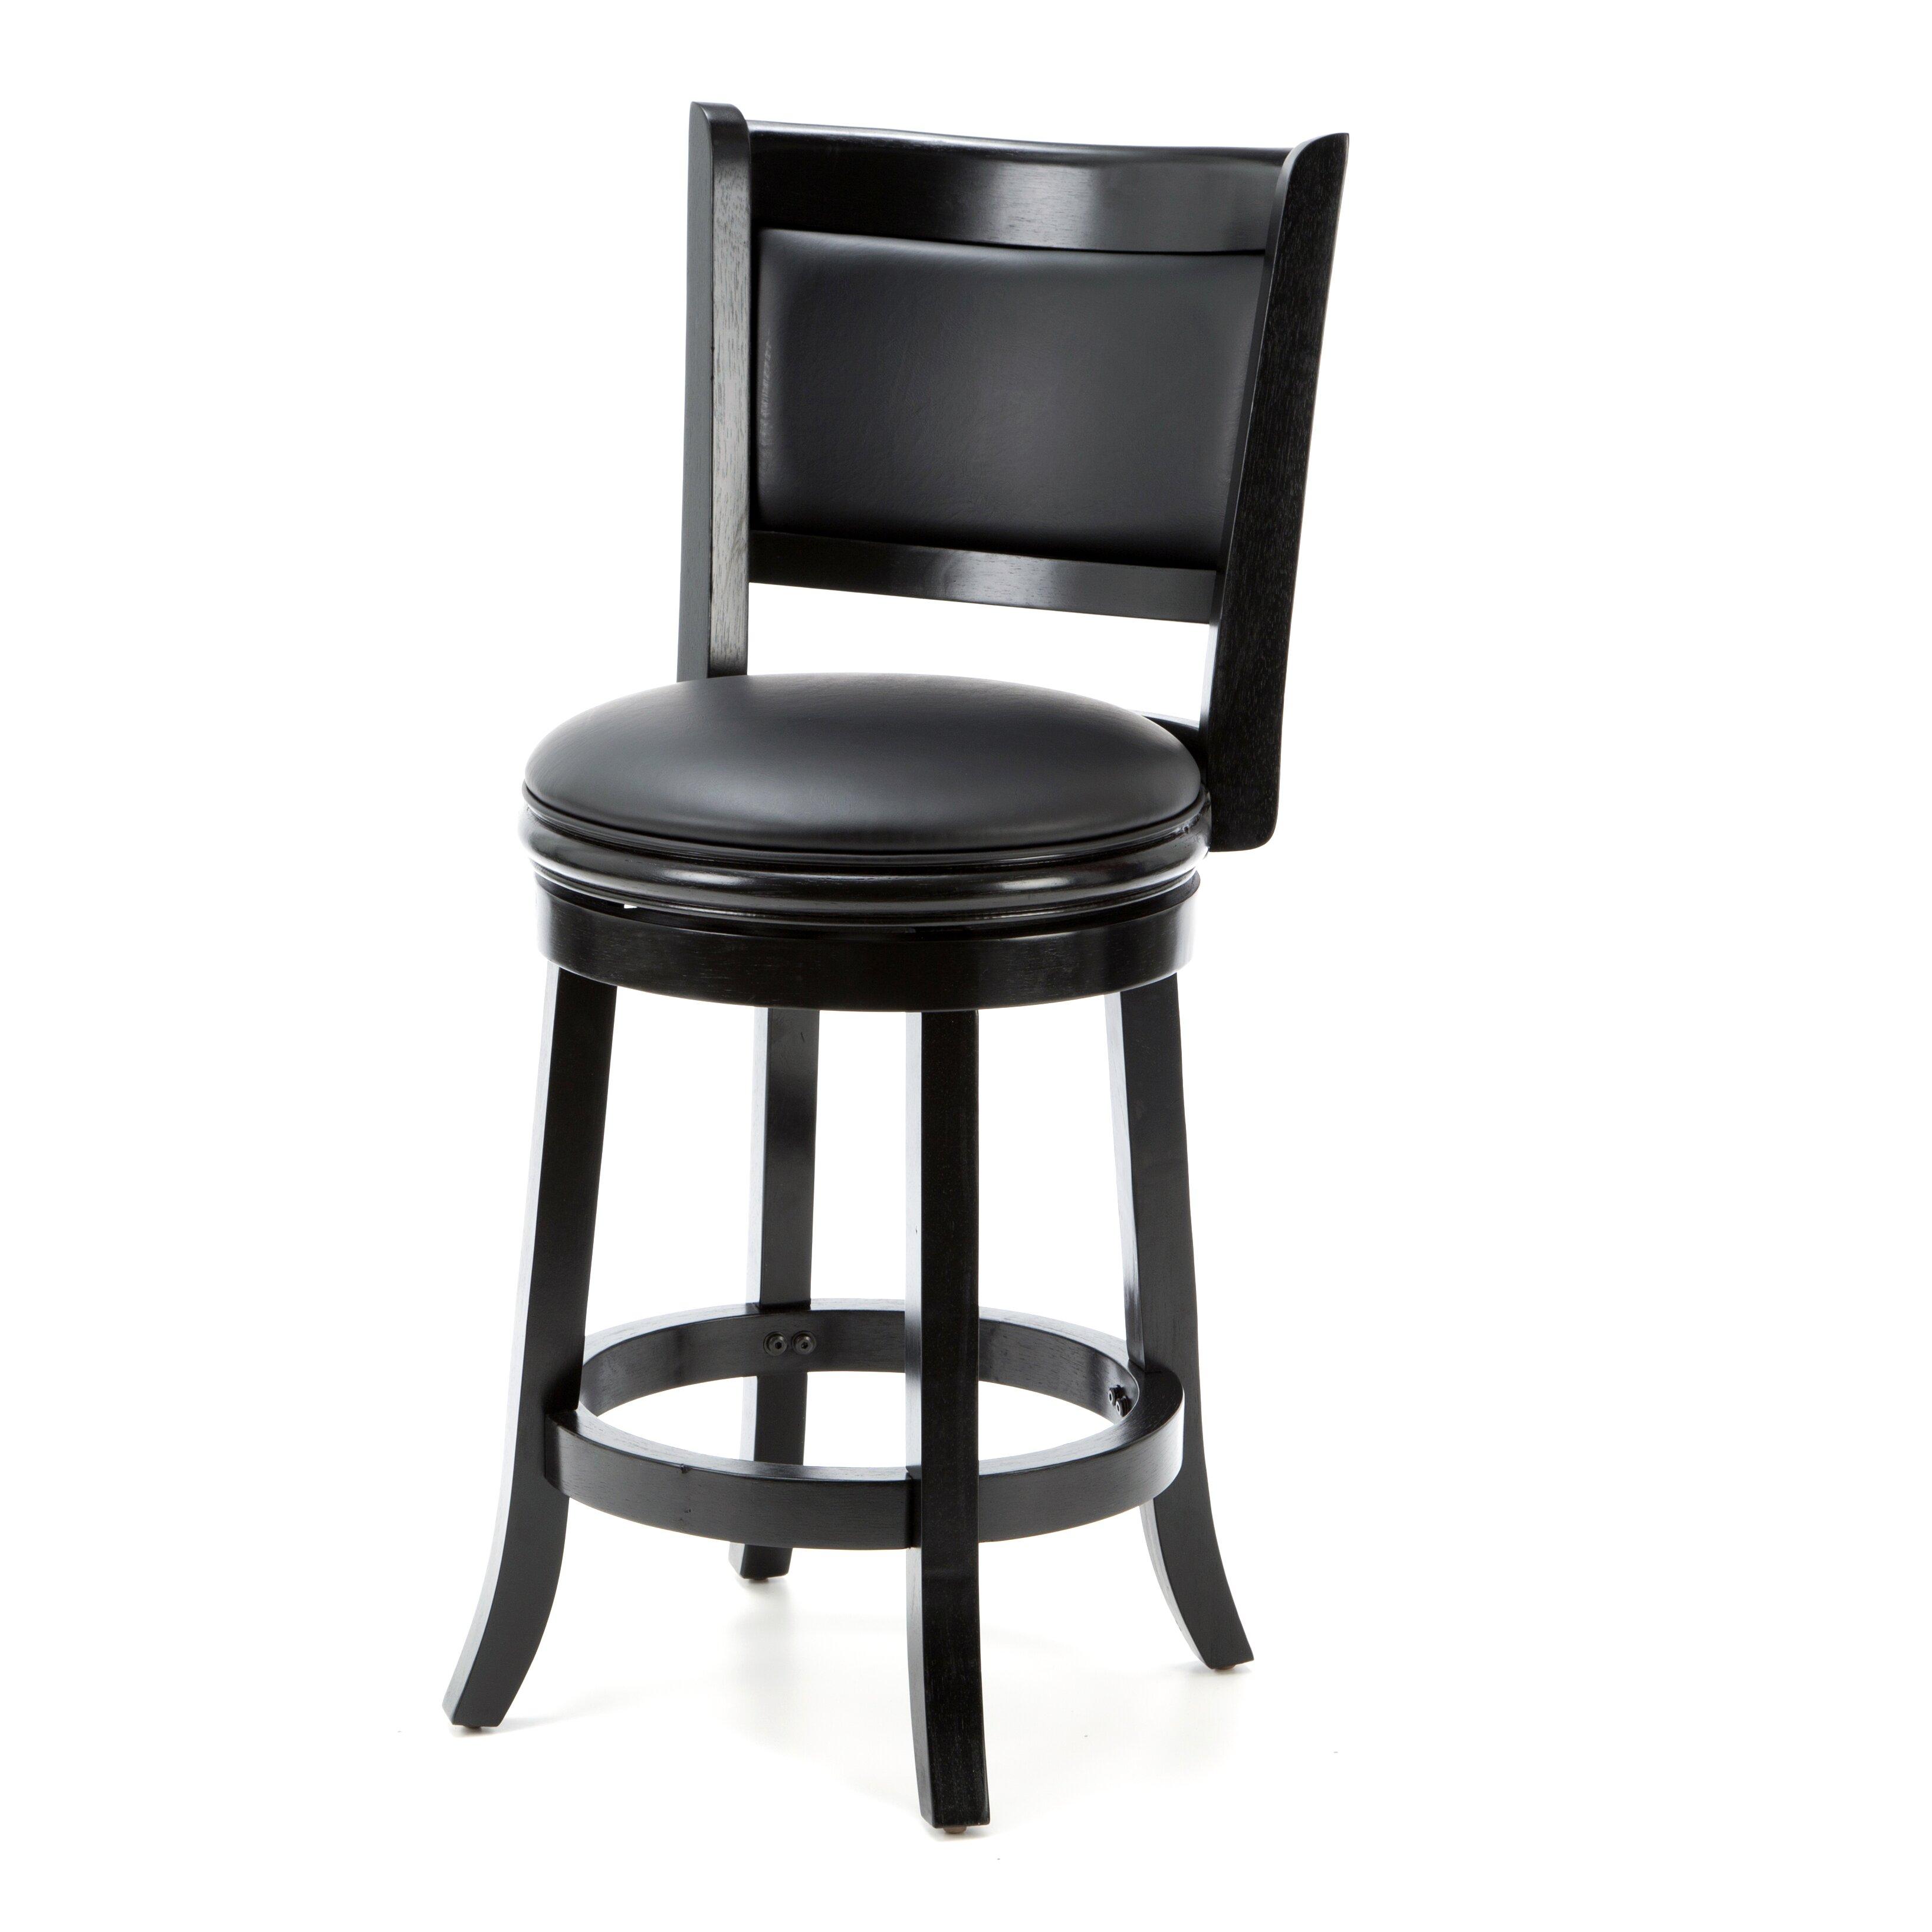 "Darby Home Co Orangeville 24"" Swivel Bar Stool & Reviews"